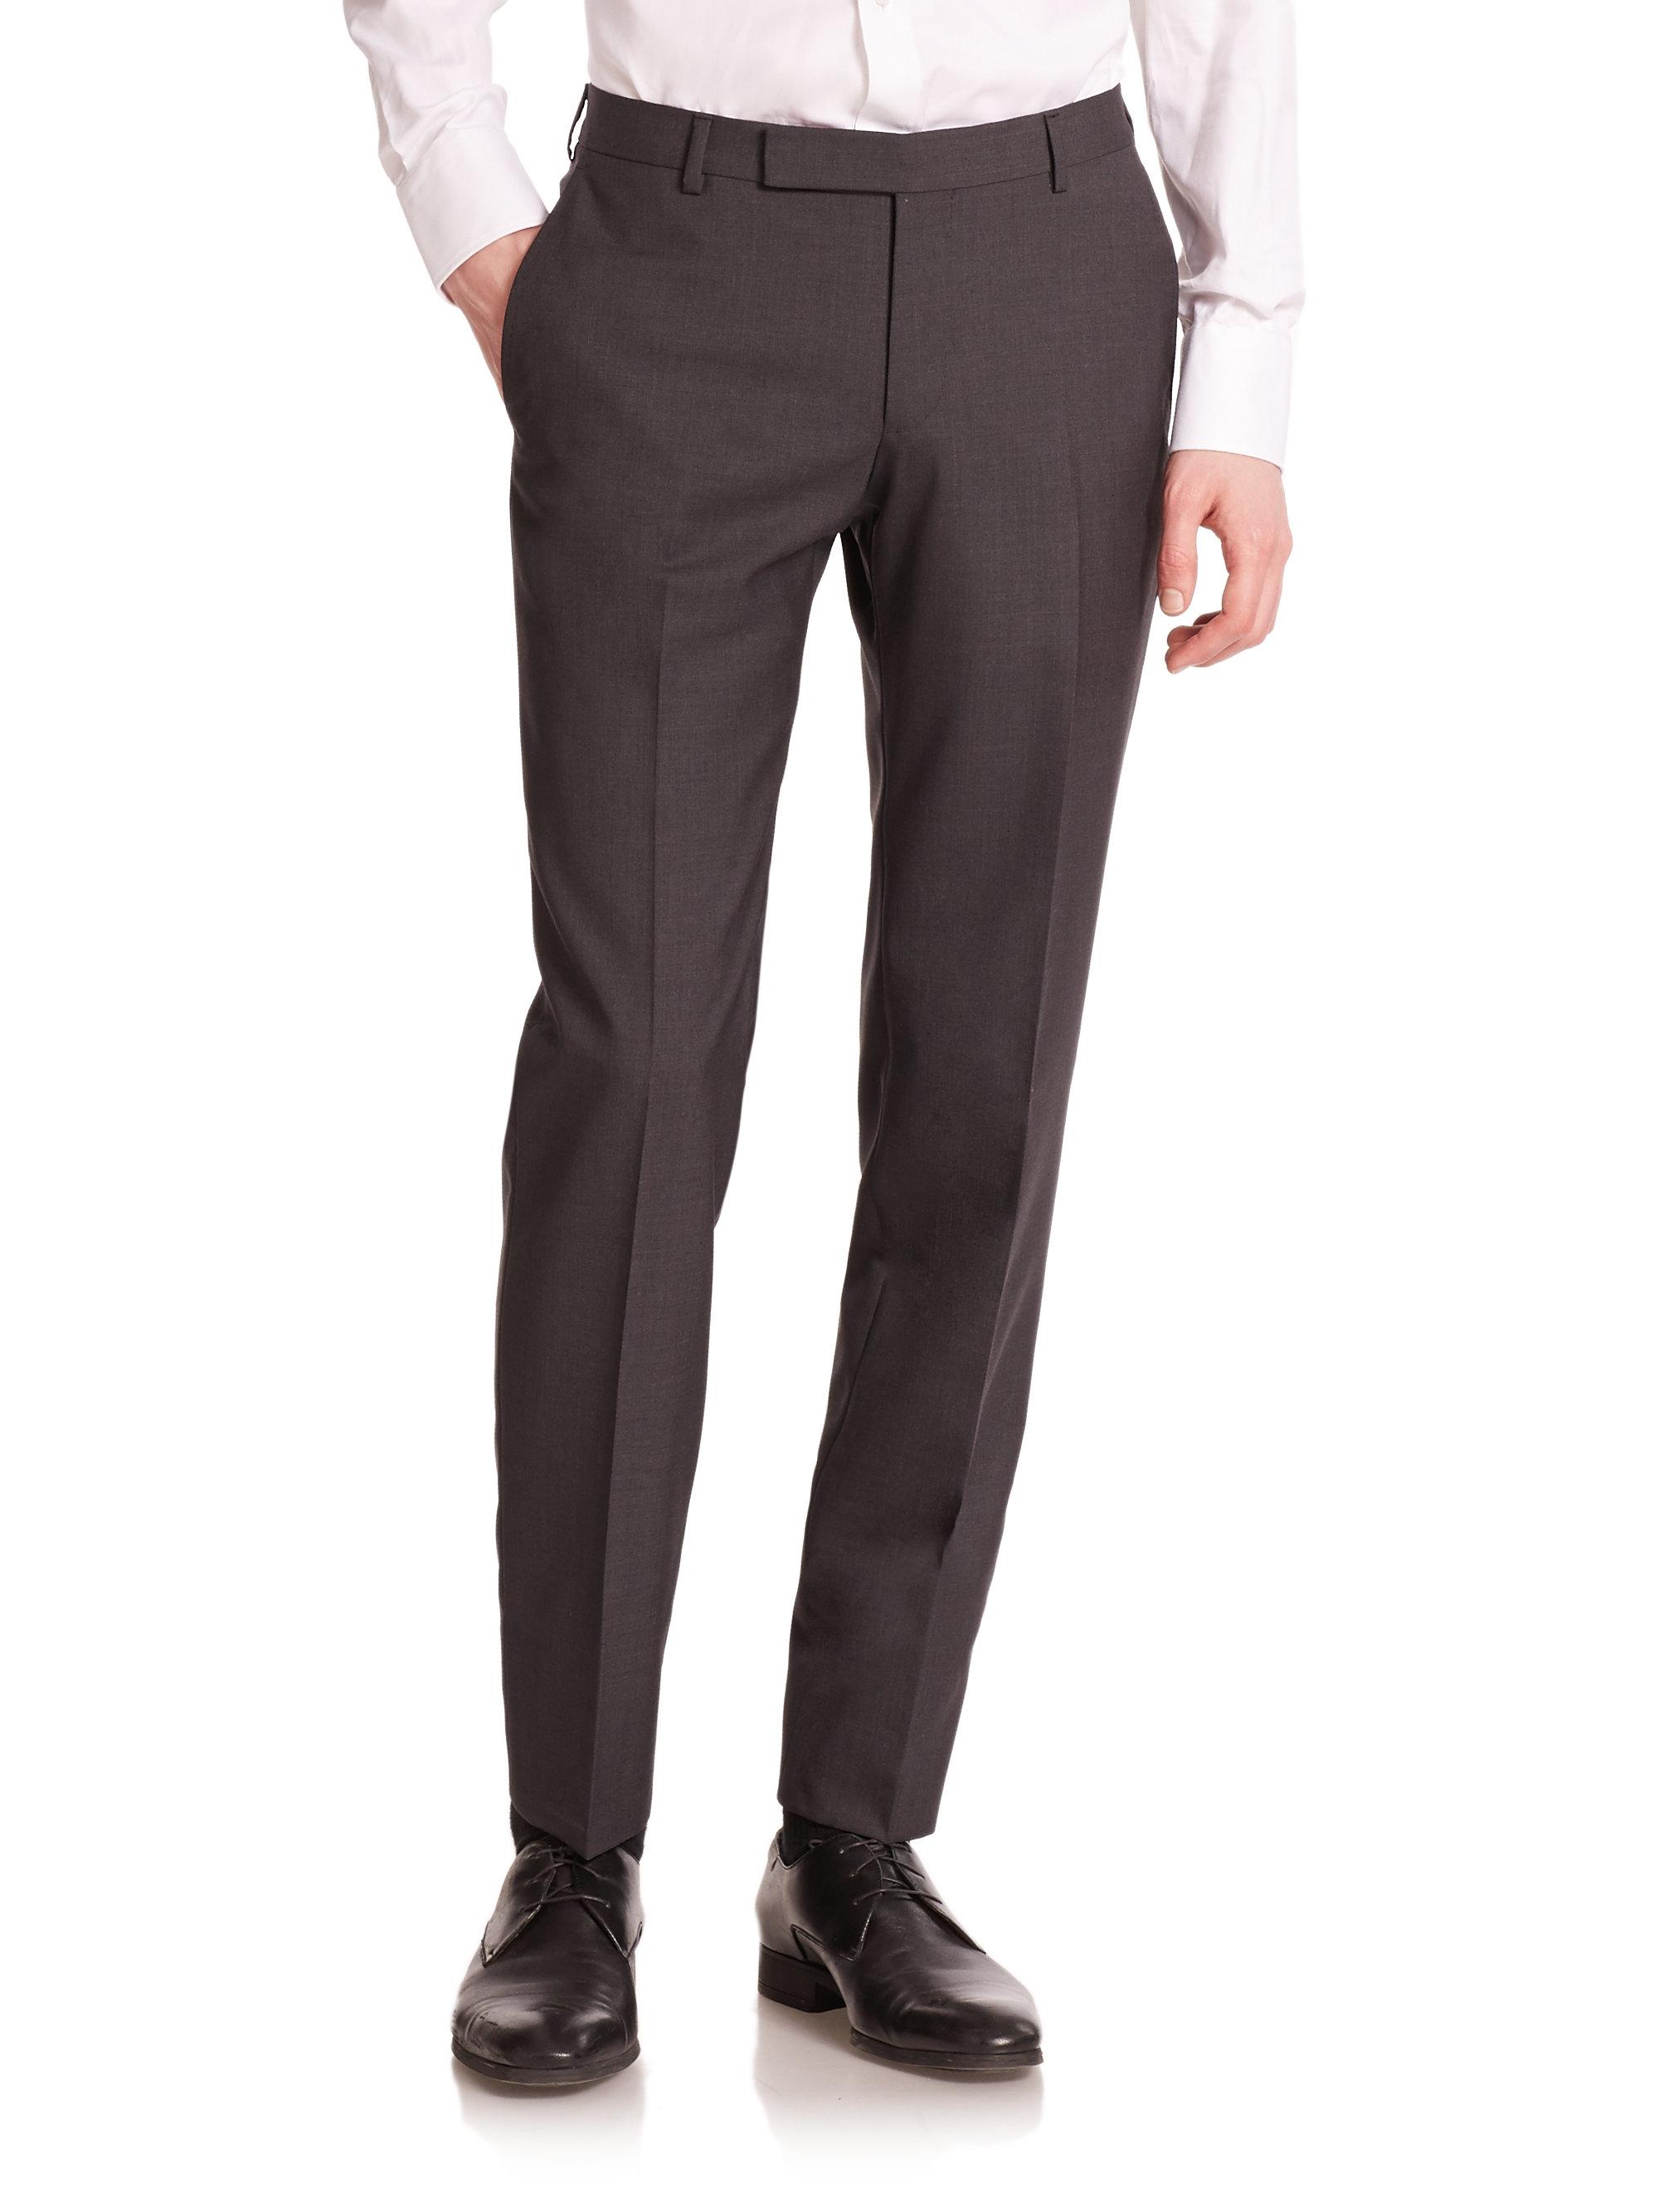 Free shipping and returns on Women's Grey Pants & Leggings at archivesnapug.cf